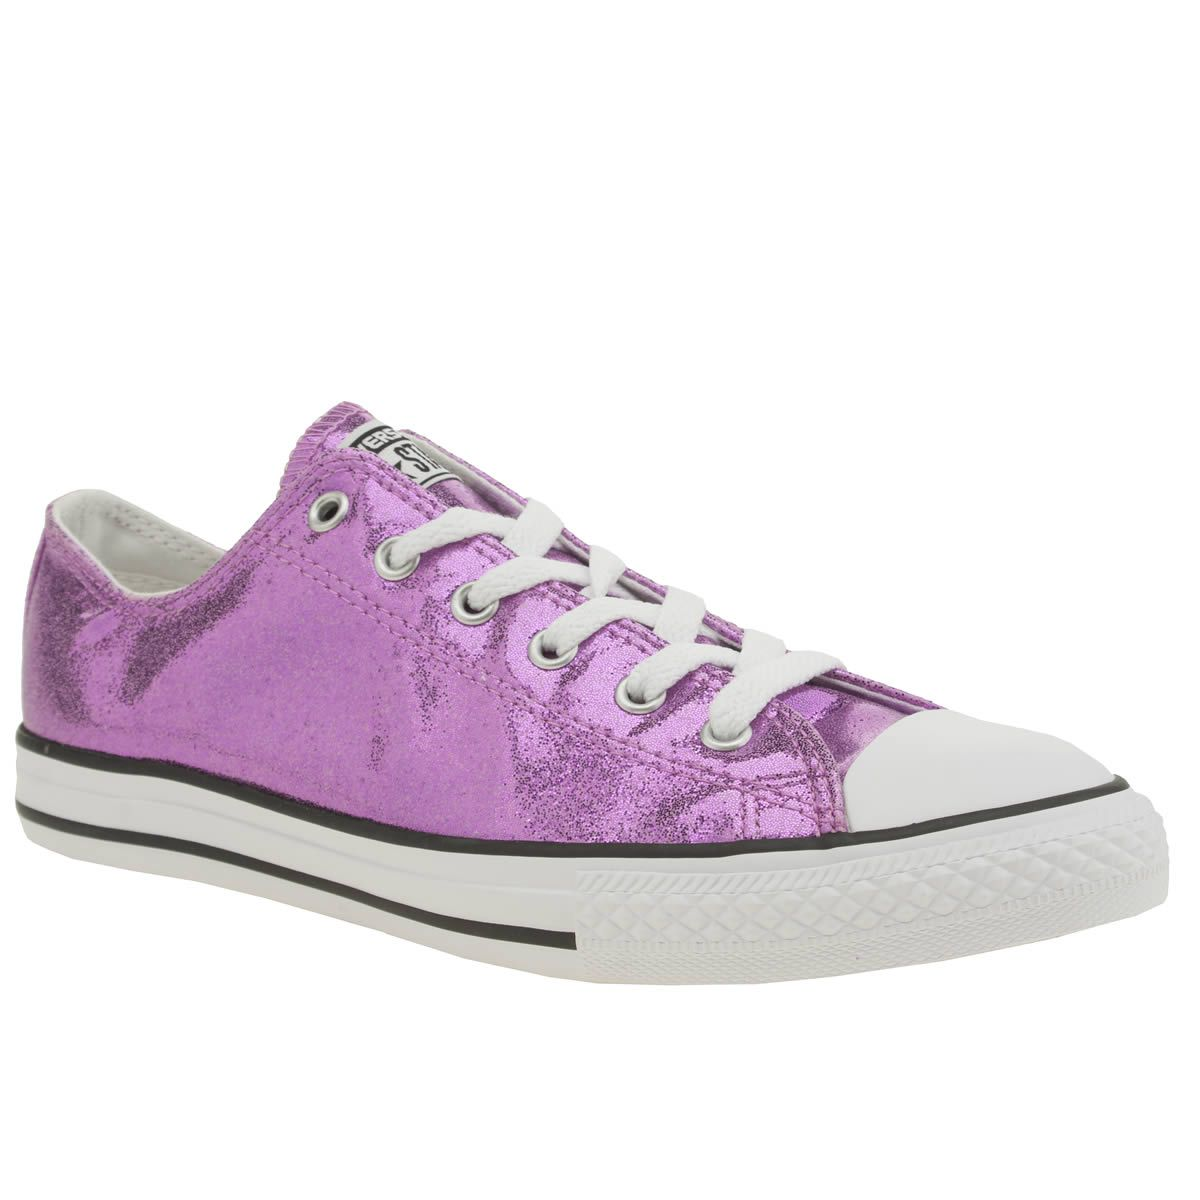 54755be23e47 kids converse pink all star ox glitter girls youth